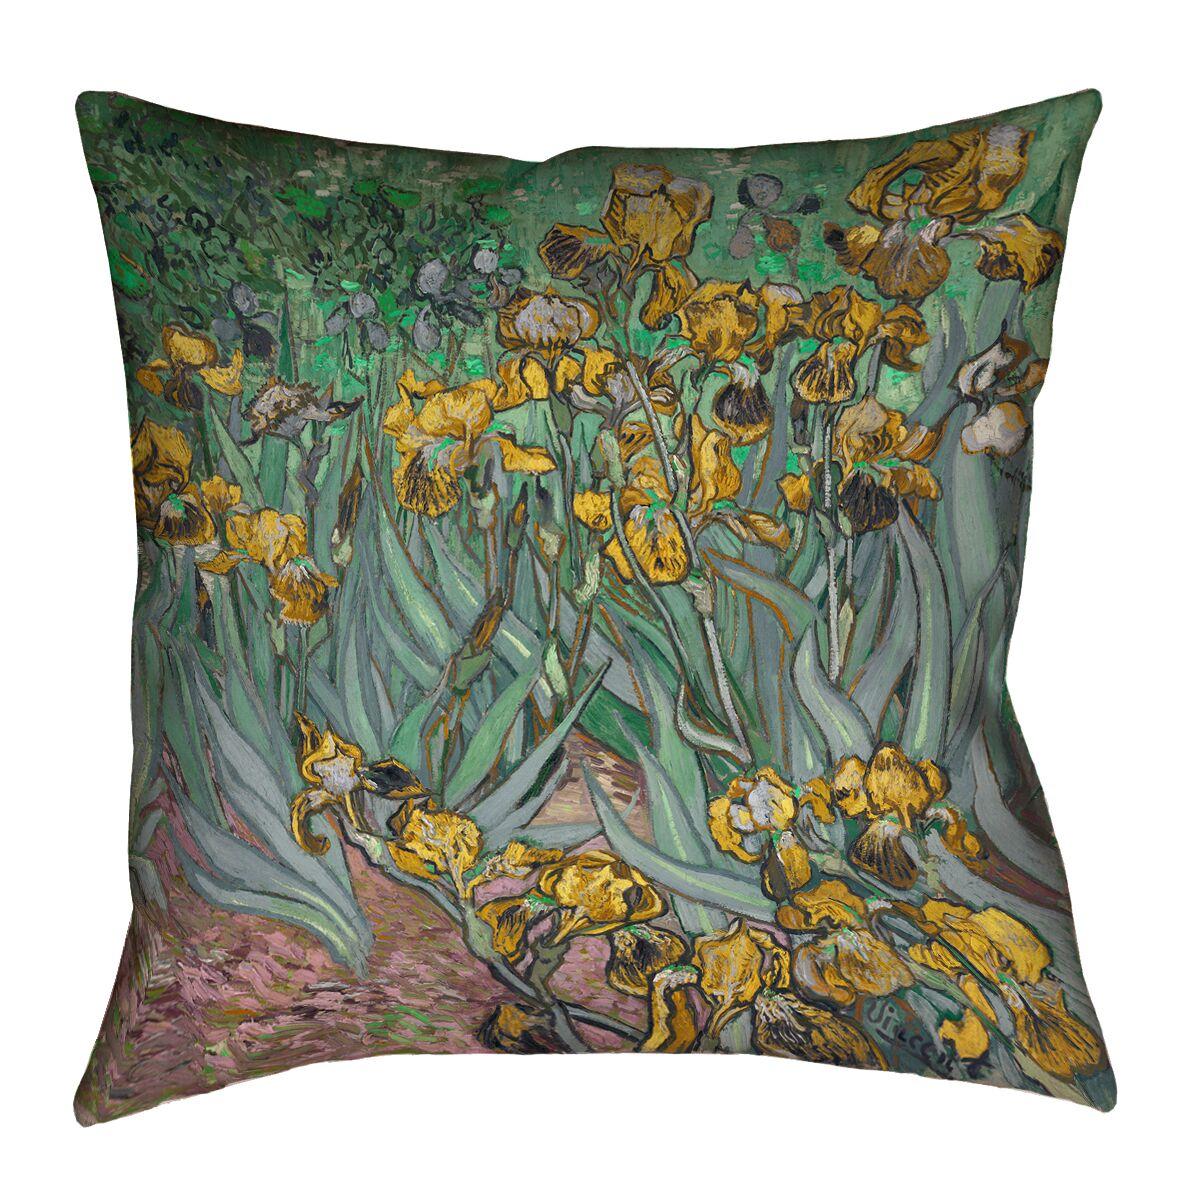 Bristol Woods Irises Outdoor Throw Pillow Size: 16